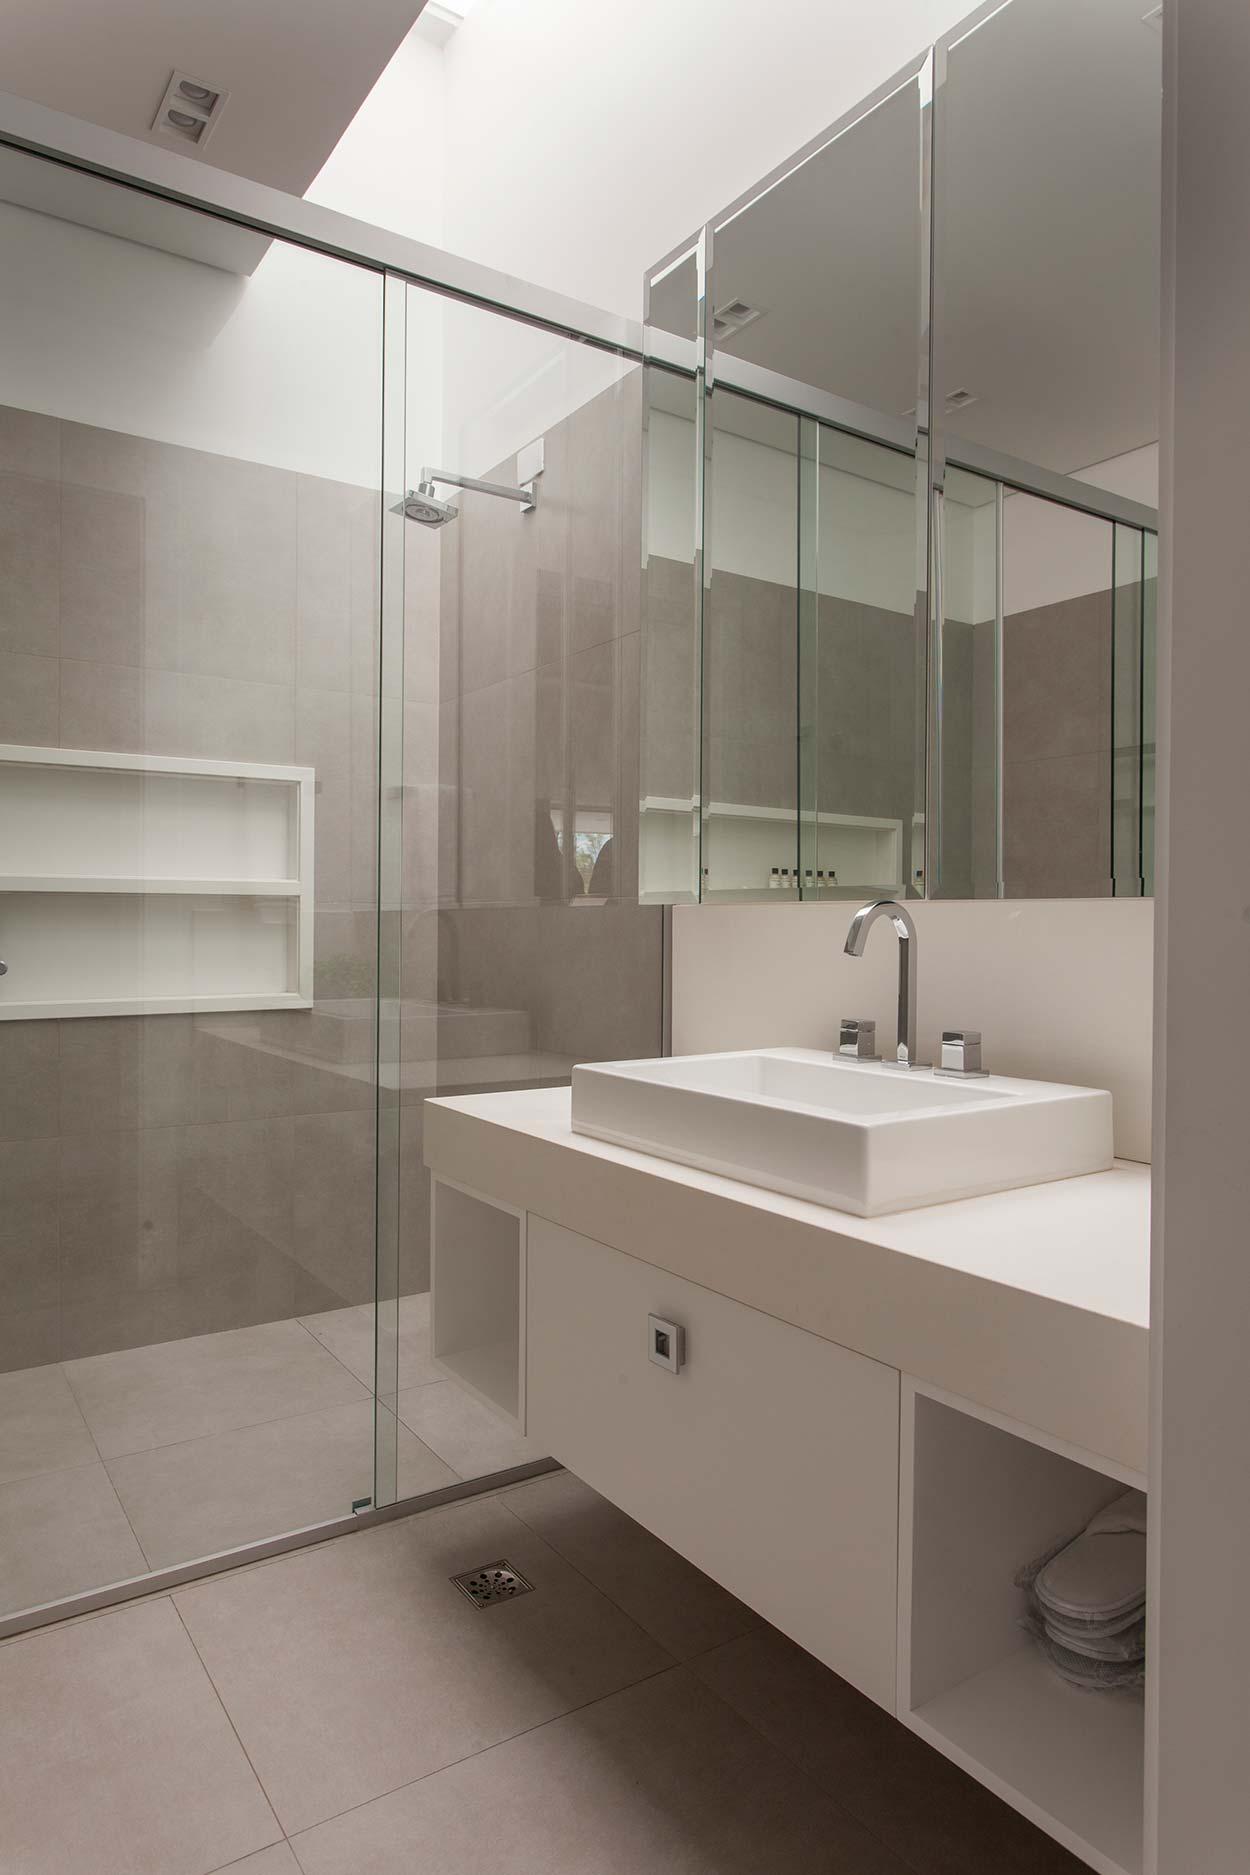 veridianaperes-interiores-Residencia-ER33